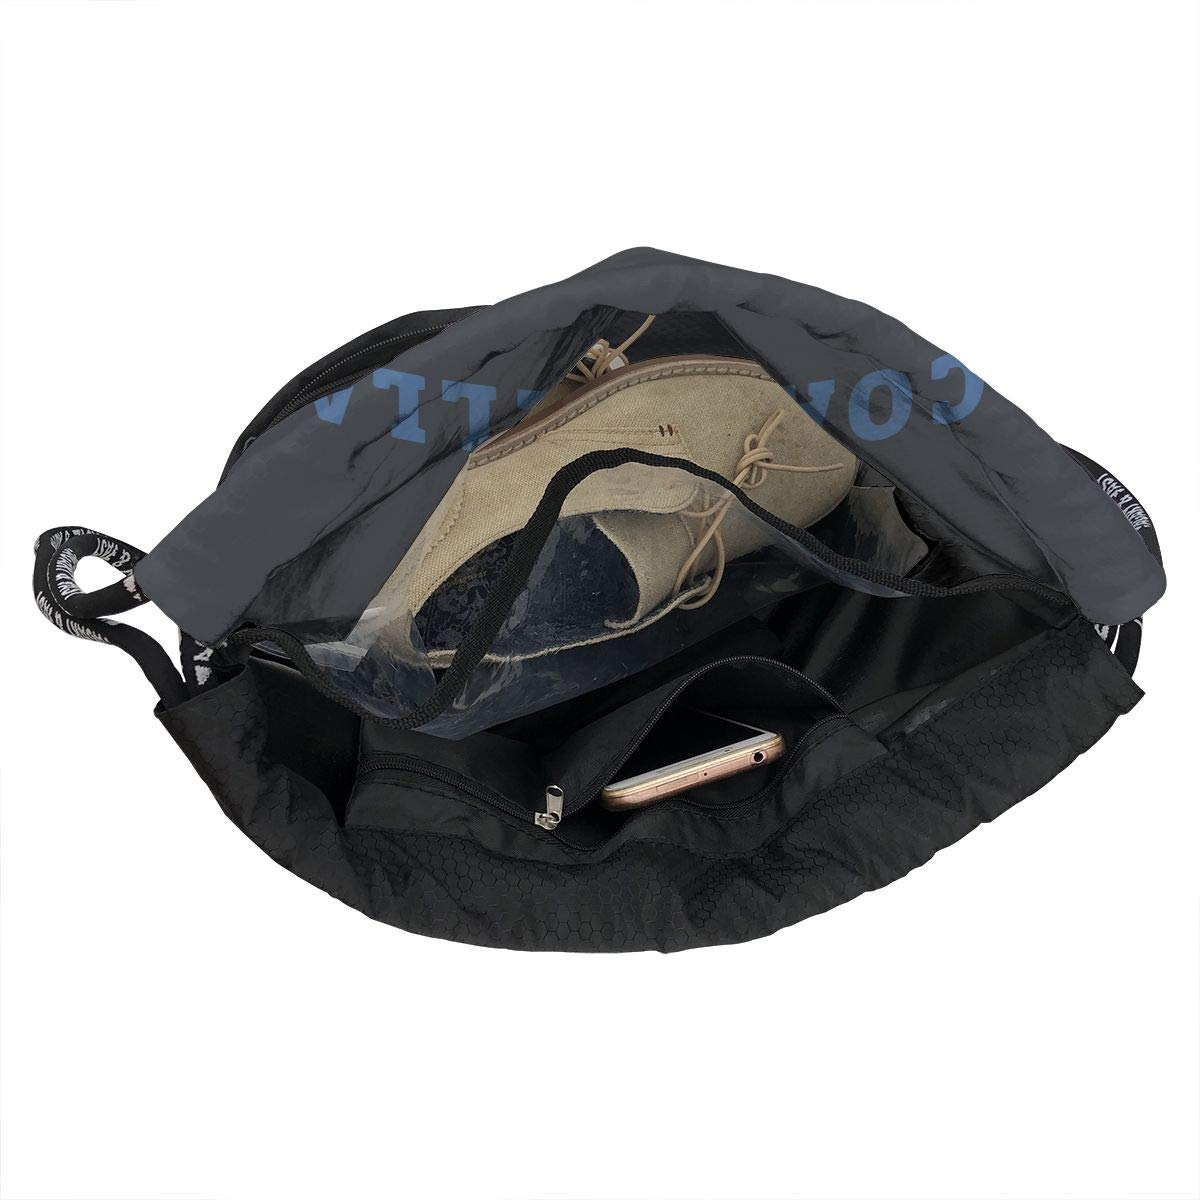 Coachella Men /& Women Drawstring Backpack Beam Mouth Sports Sackpack Rucksack Shoulder Bags